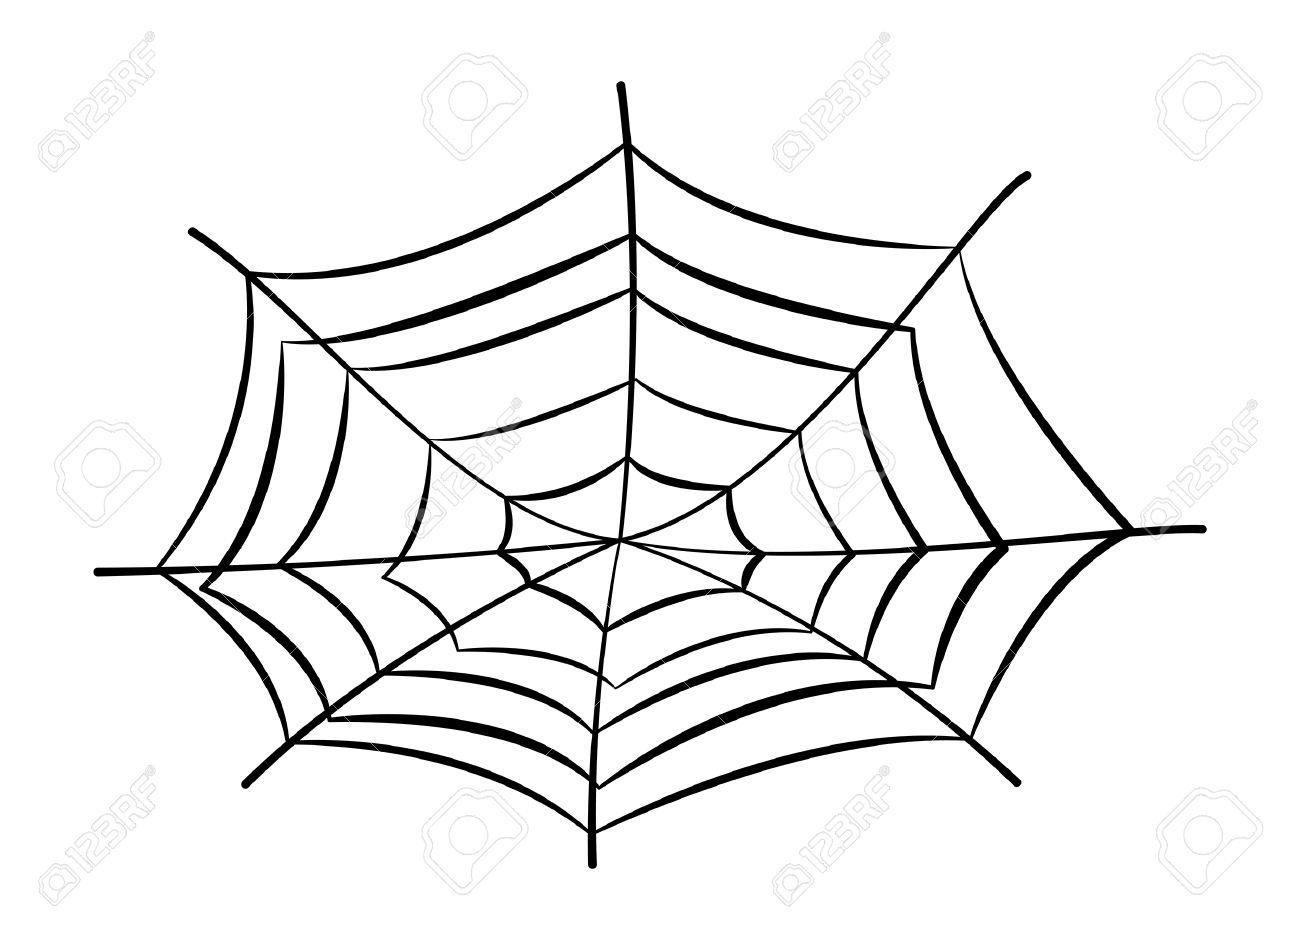 1300x950 Spider Web Cartoon Drawing Spider Web Cartoon